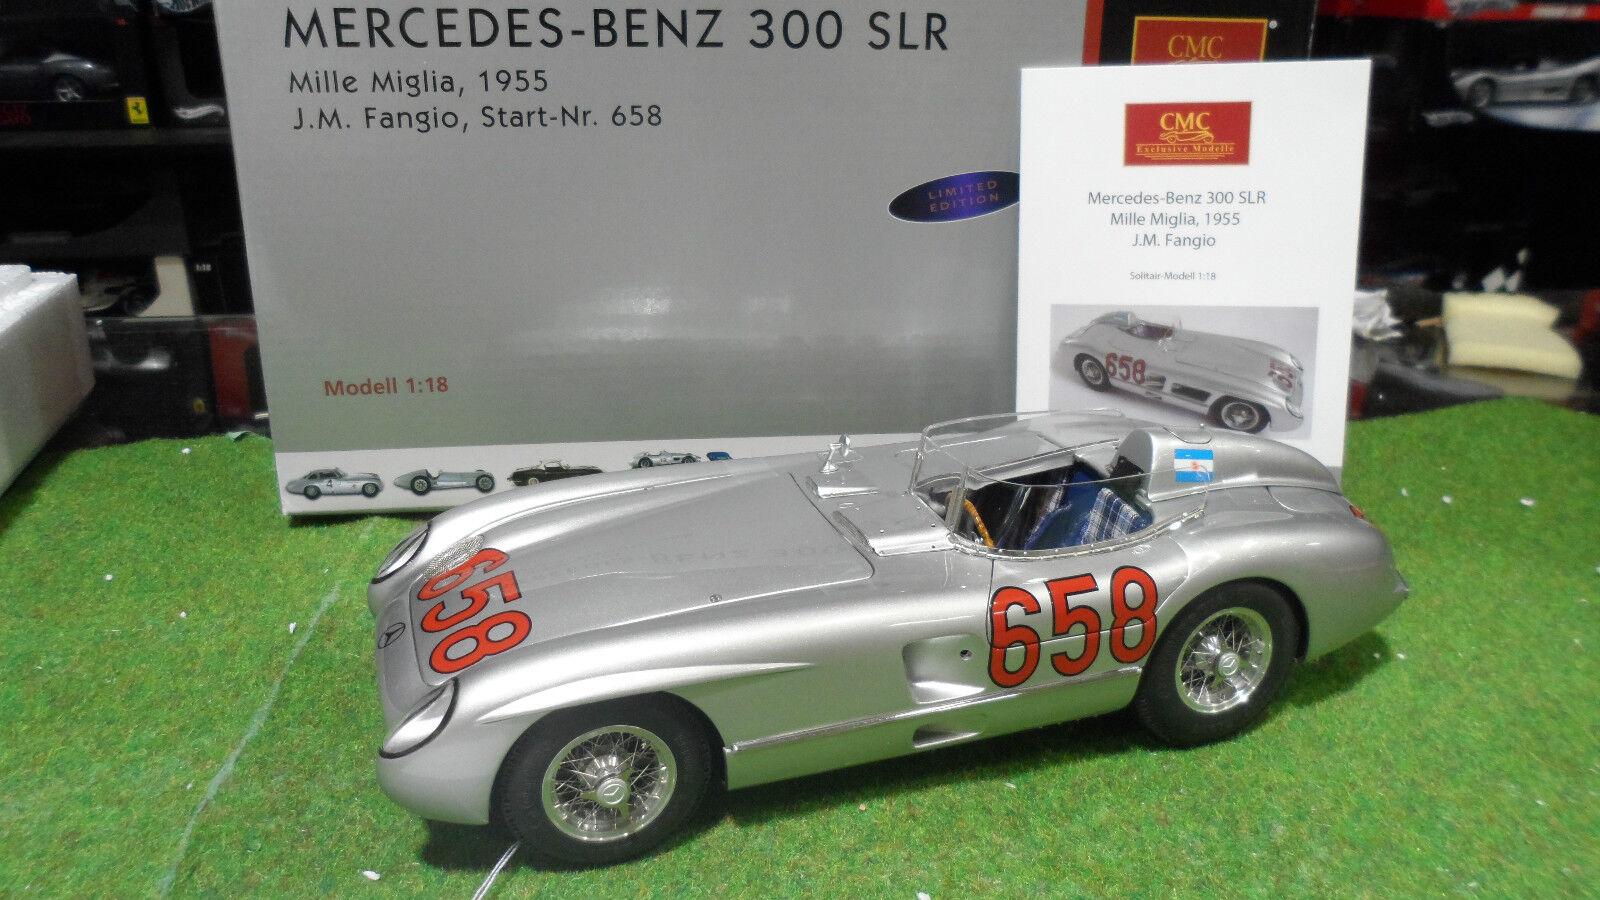 MERCEDES-BENZ 300 SLR 1955 FANGIO MILLE MIGLIA 1 18 CMC M117 voiture miniature